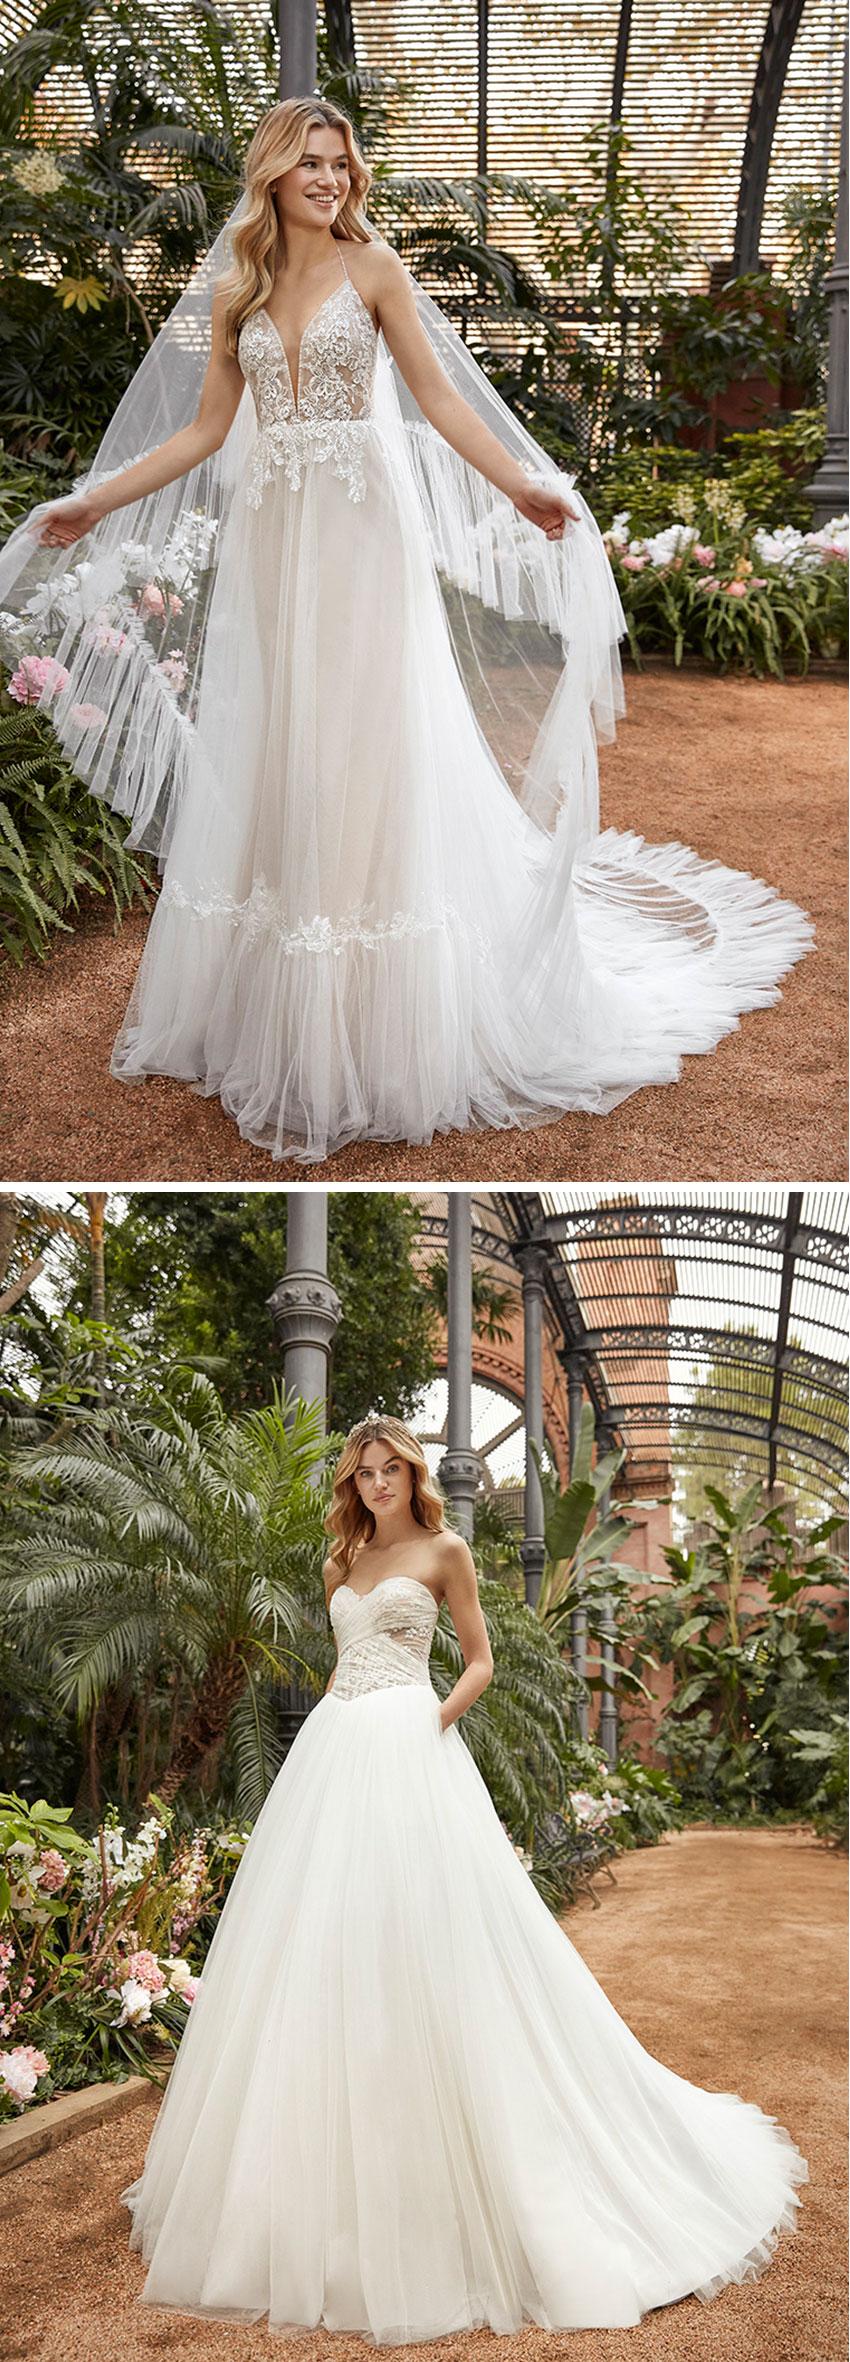 St. Patrick La Sposa 20201 collection features 3D floral appliqué featured in Perfect Wedding Magazine